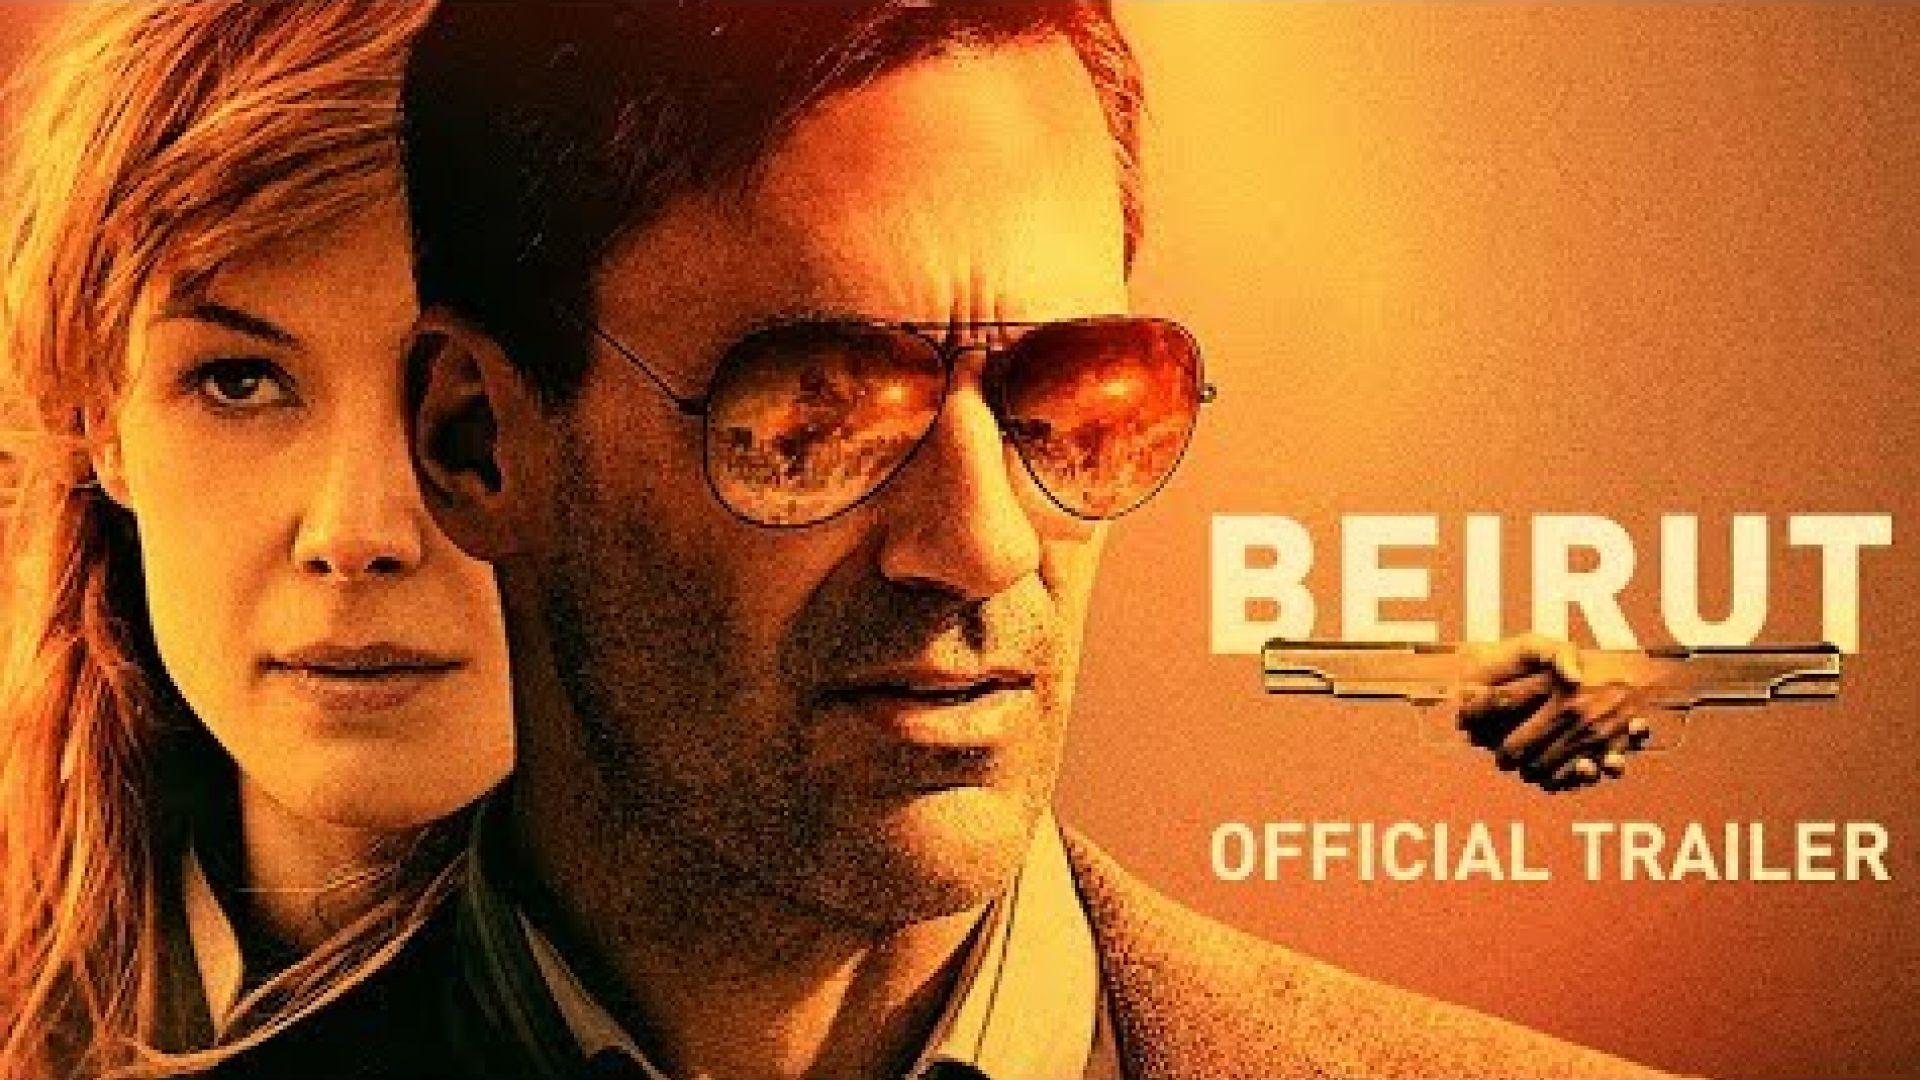 Beirut - Trailer